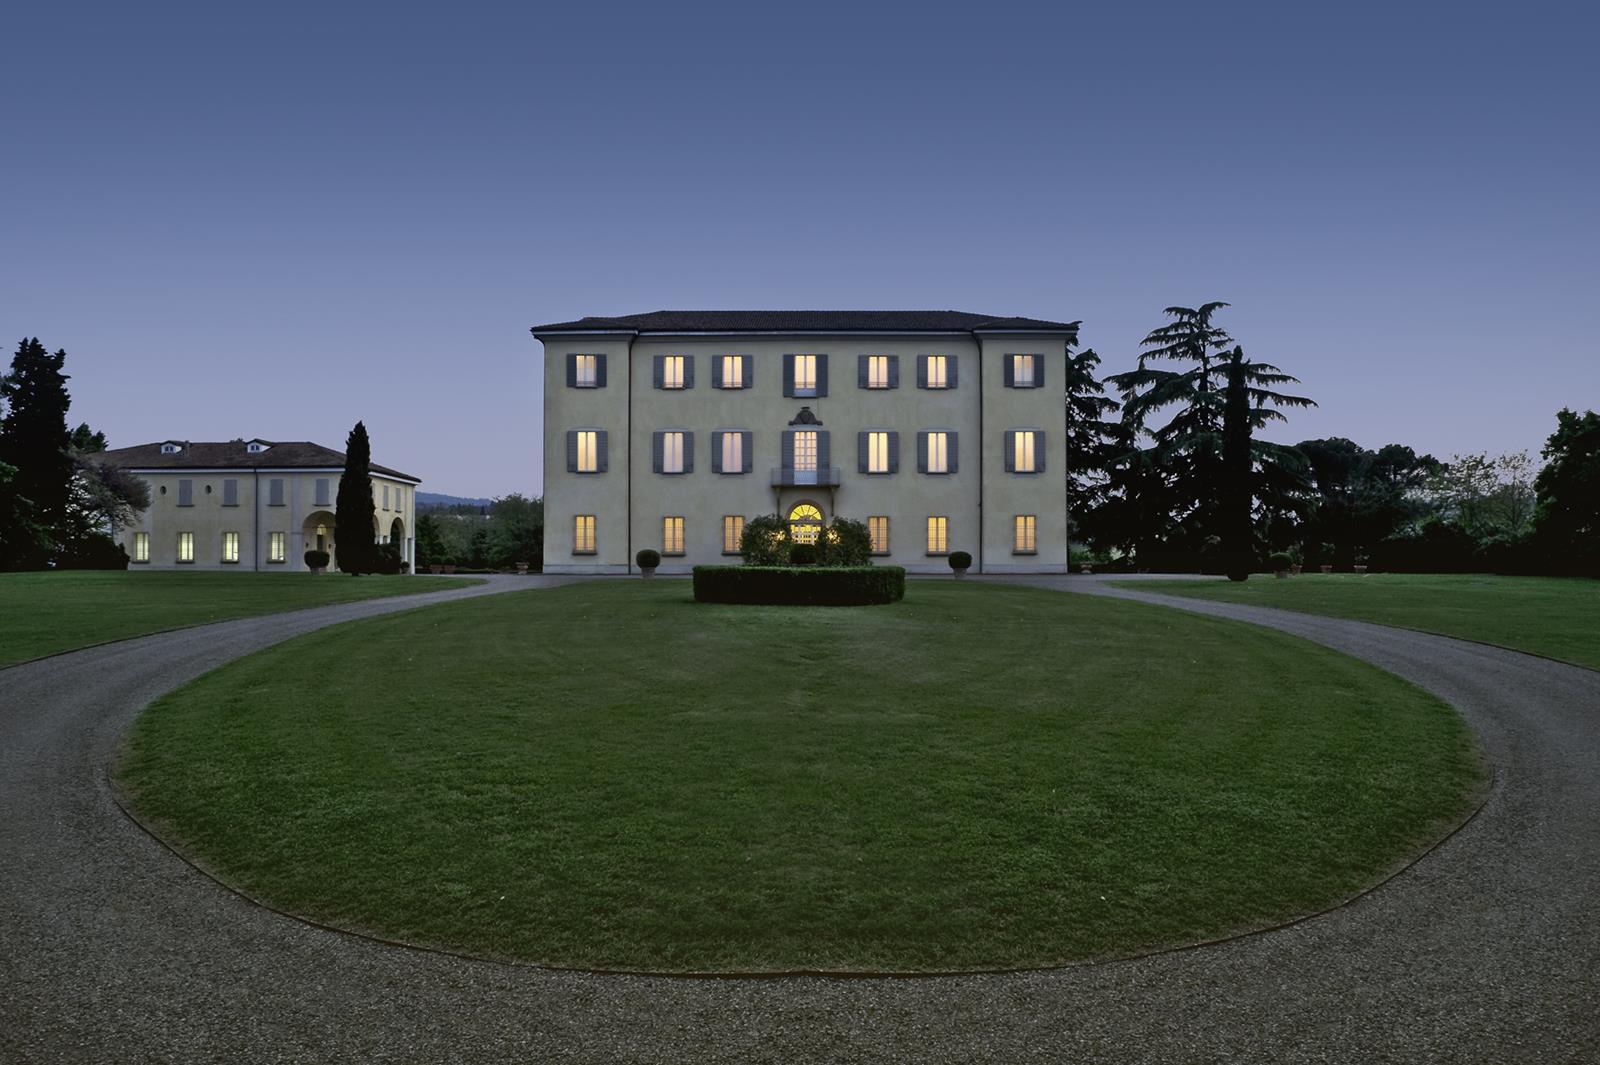 Villa Furla